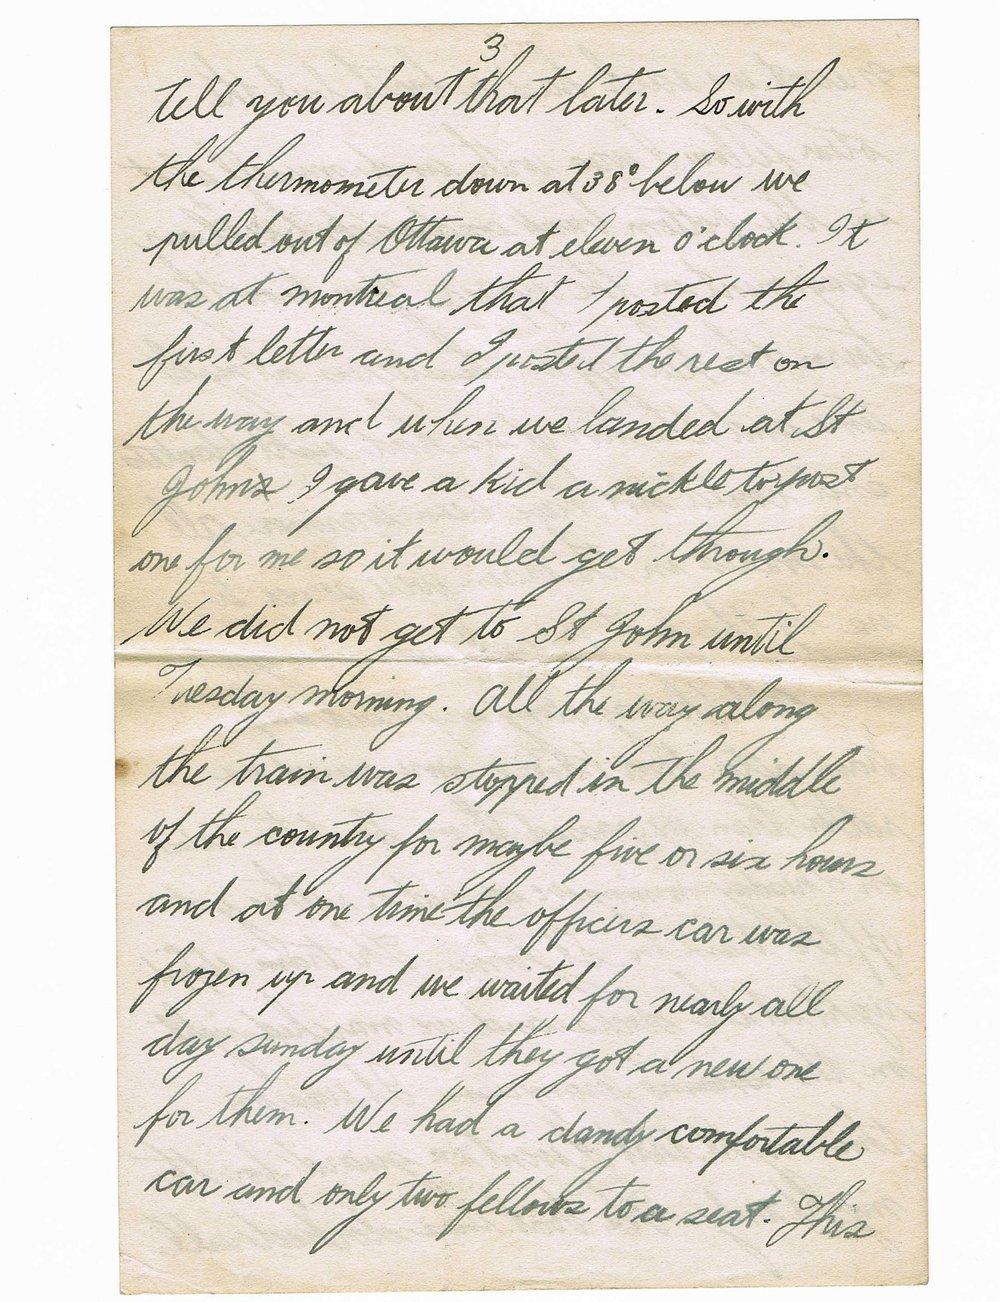 Basil Vale January 2, 1918 letter - page 3.jpg